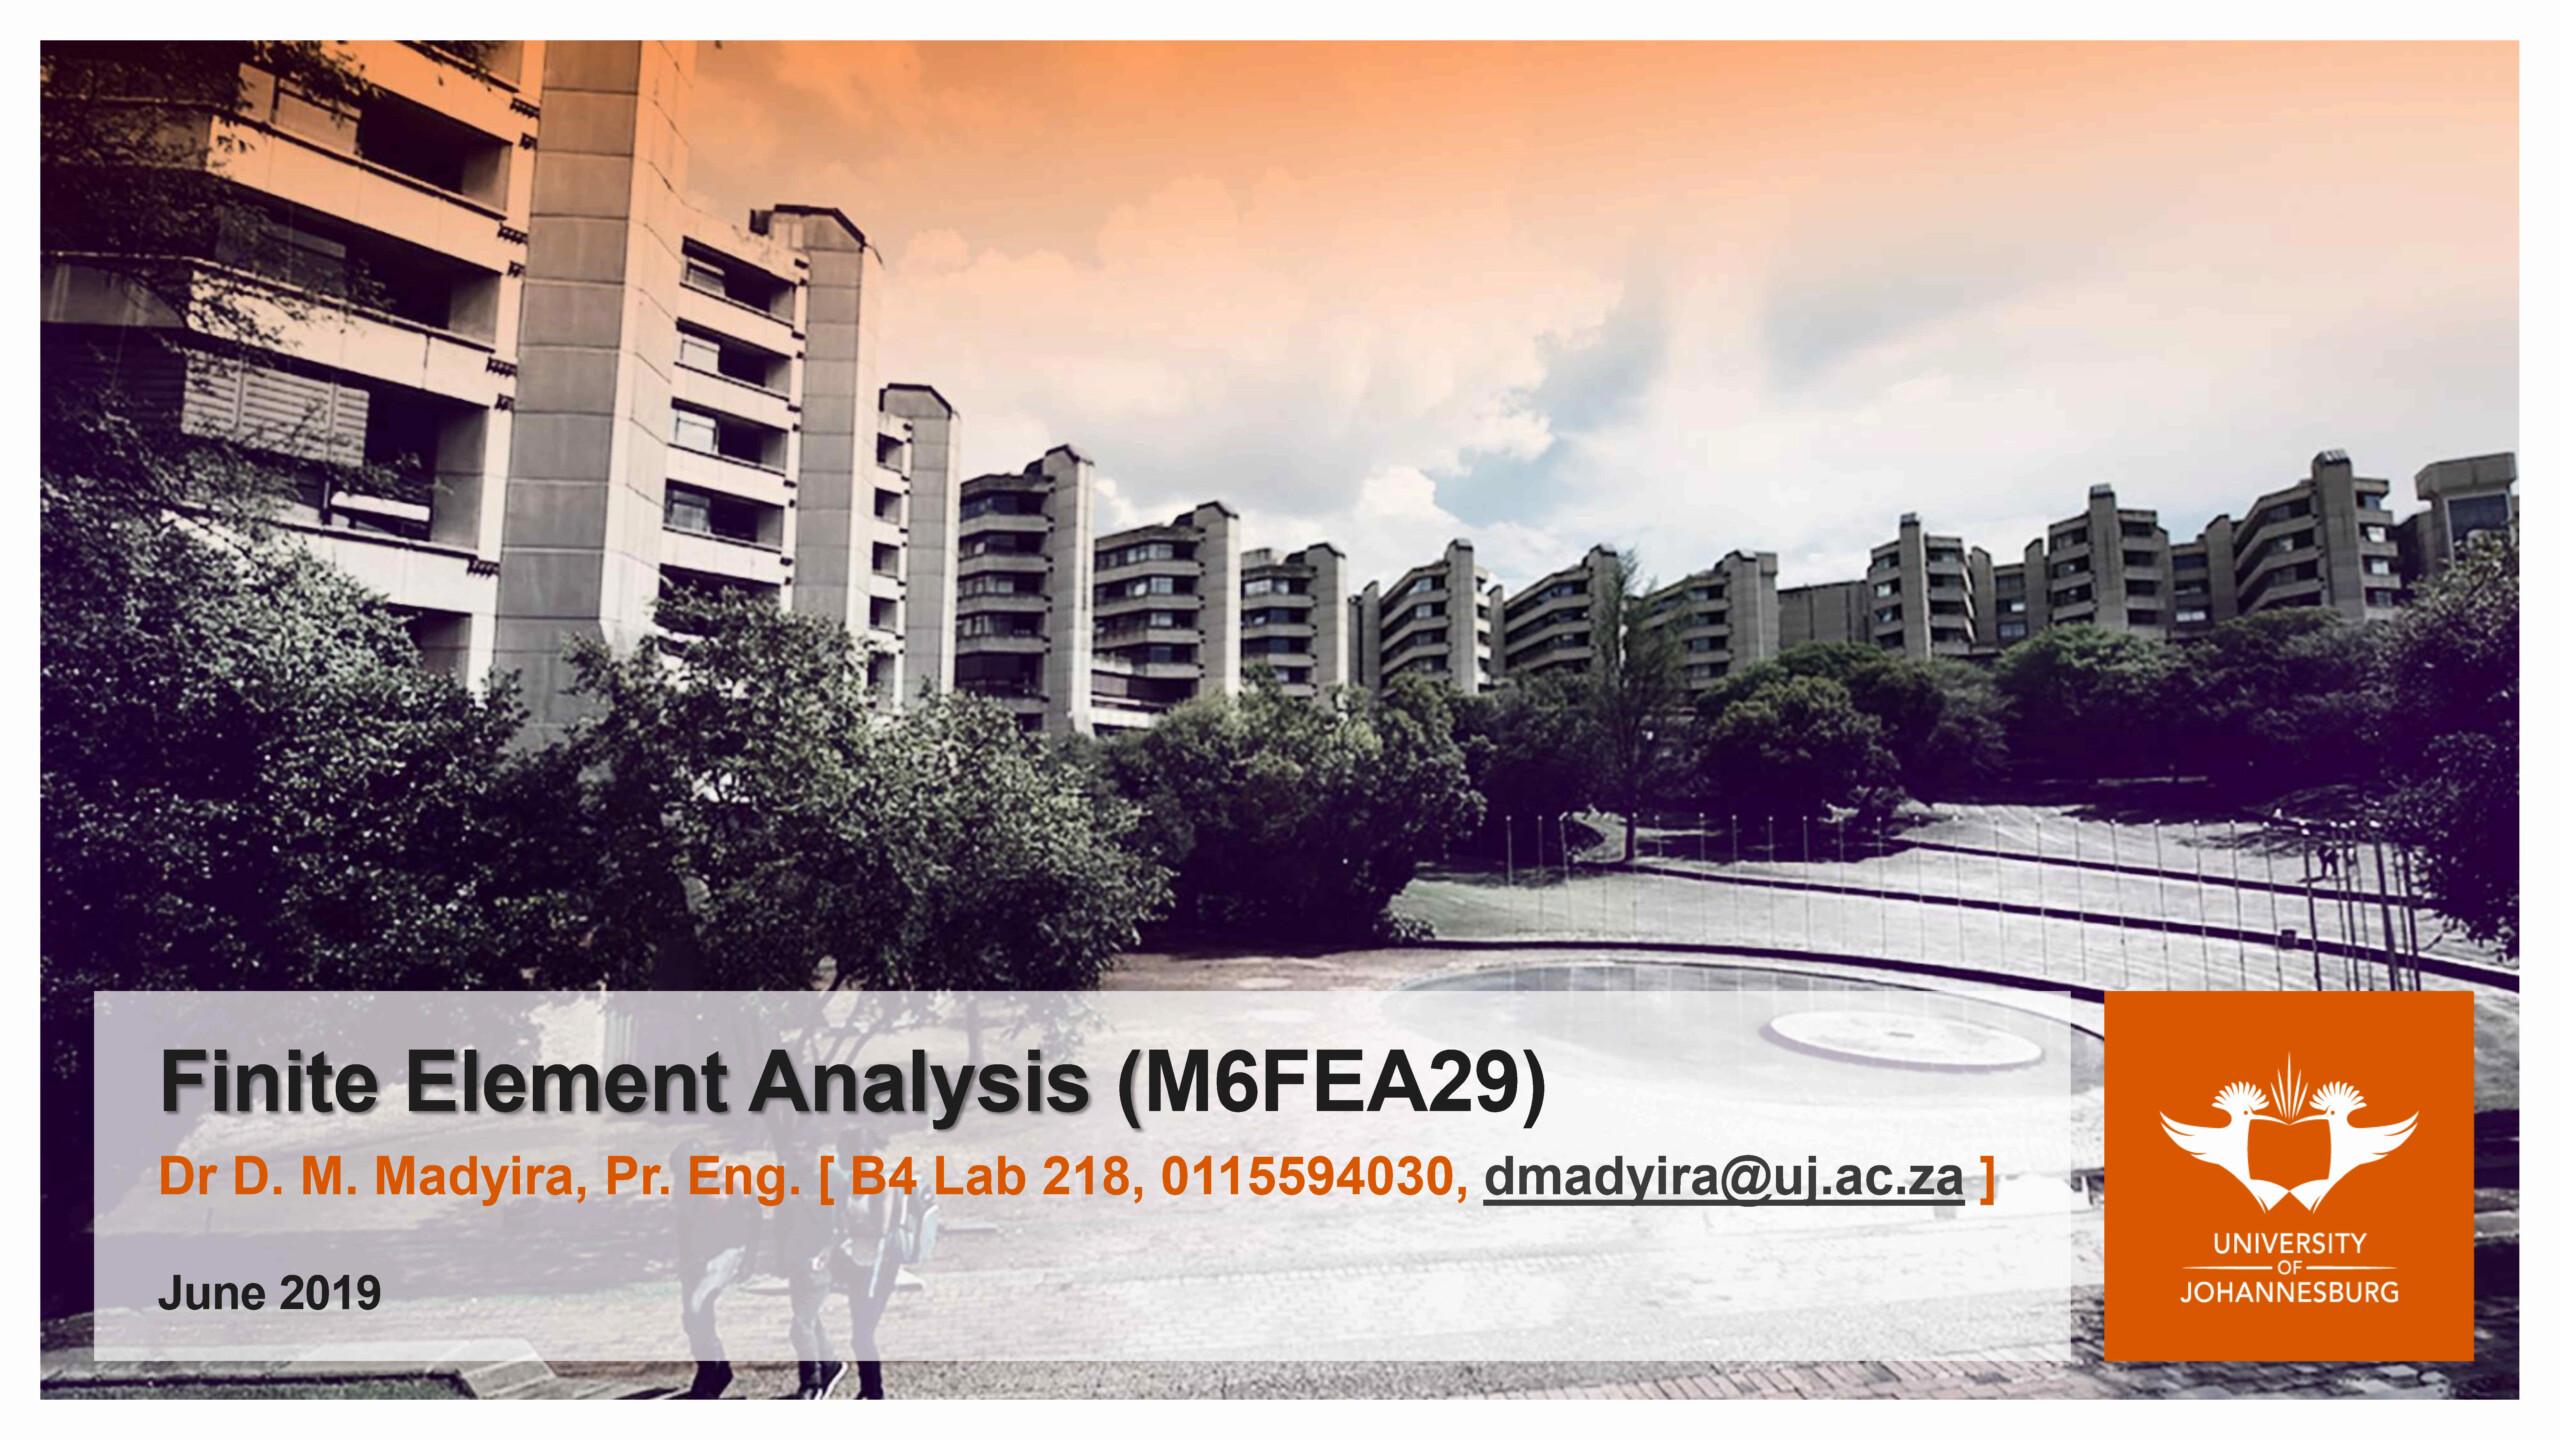 محاضرة بعنوان Finite Element Analysis F_e_a_19